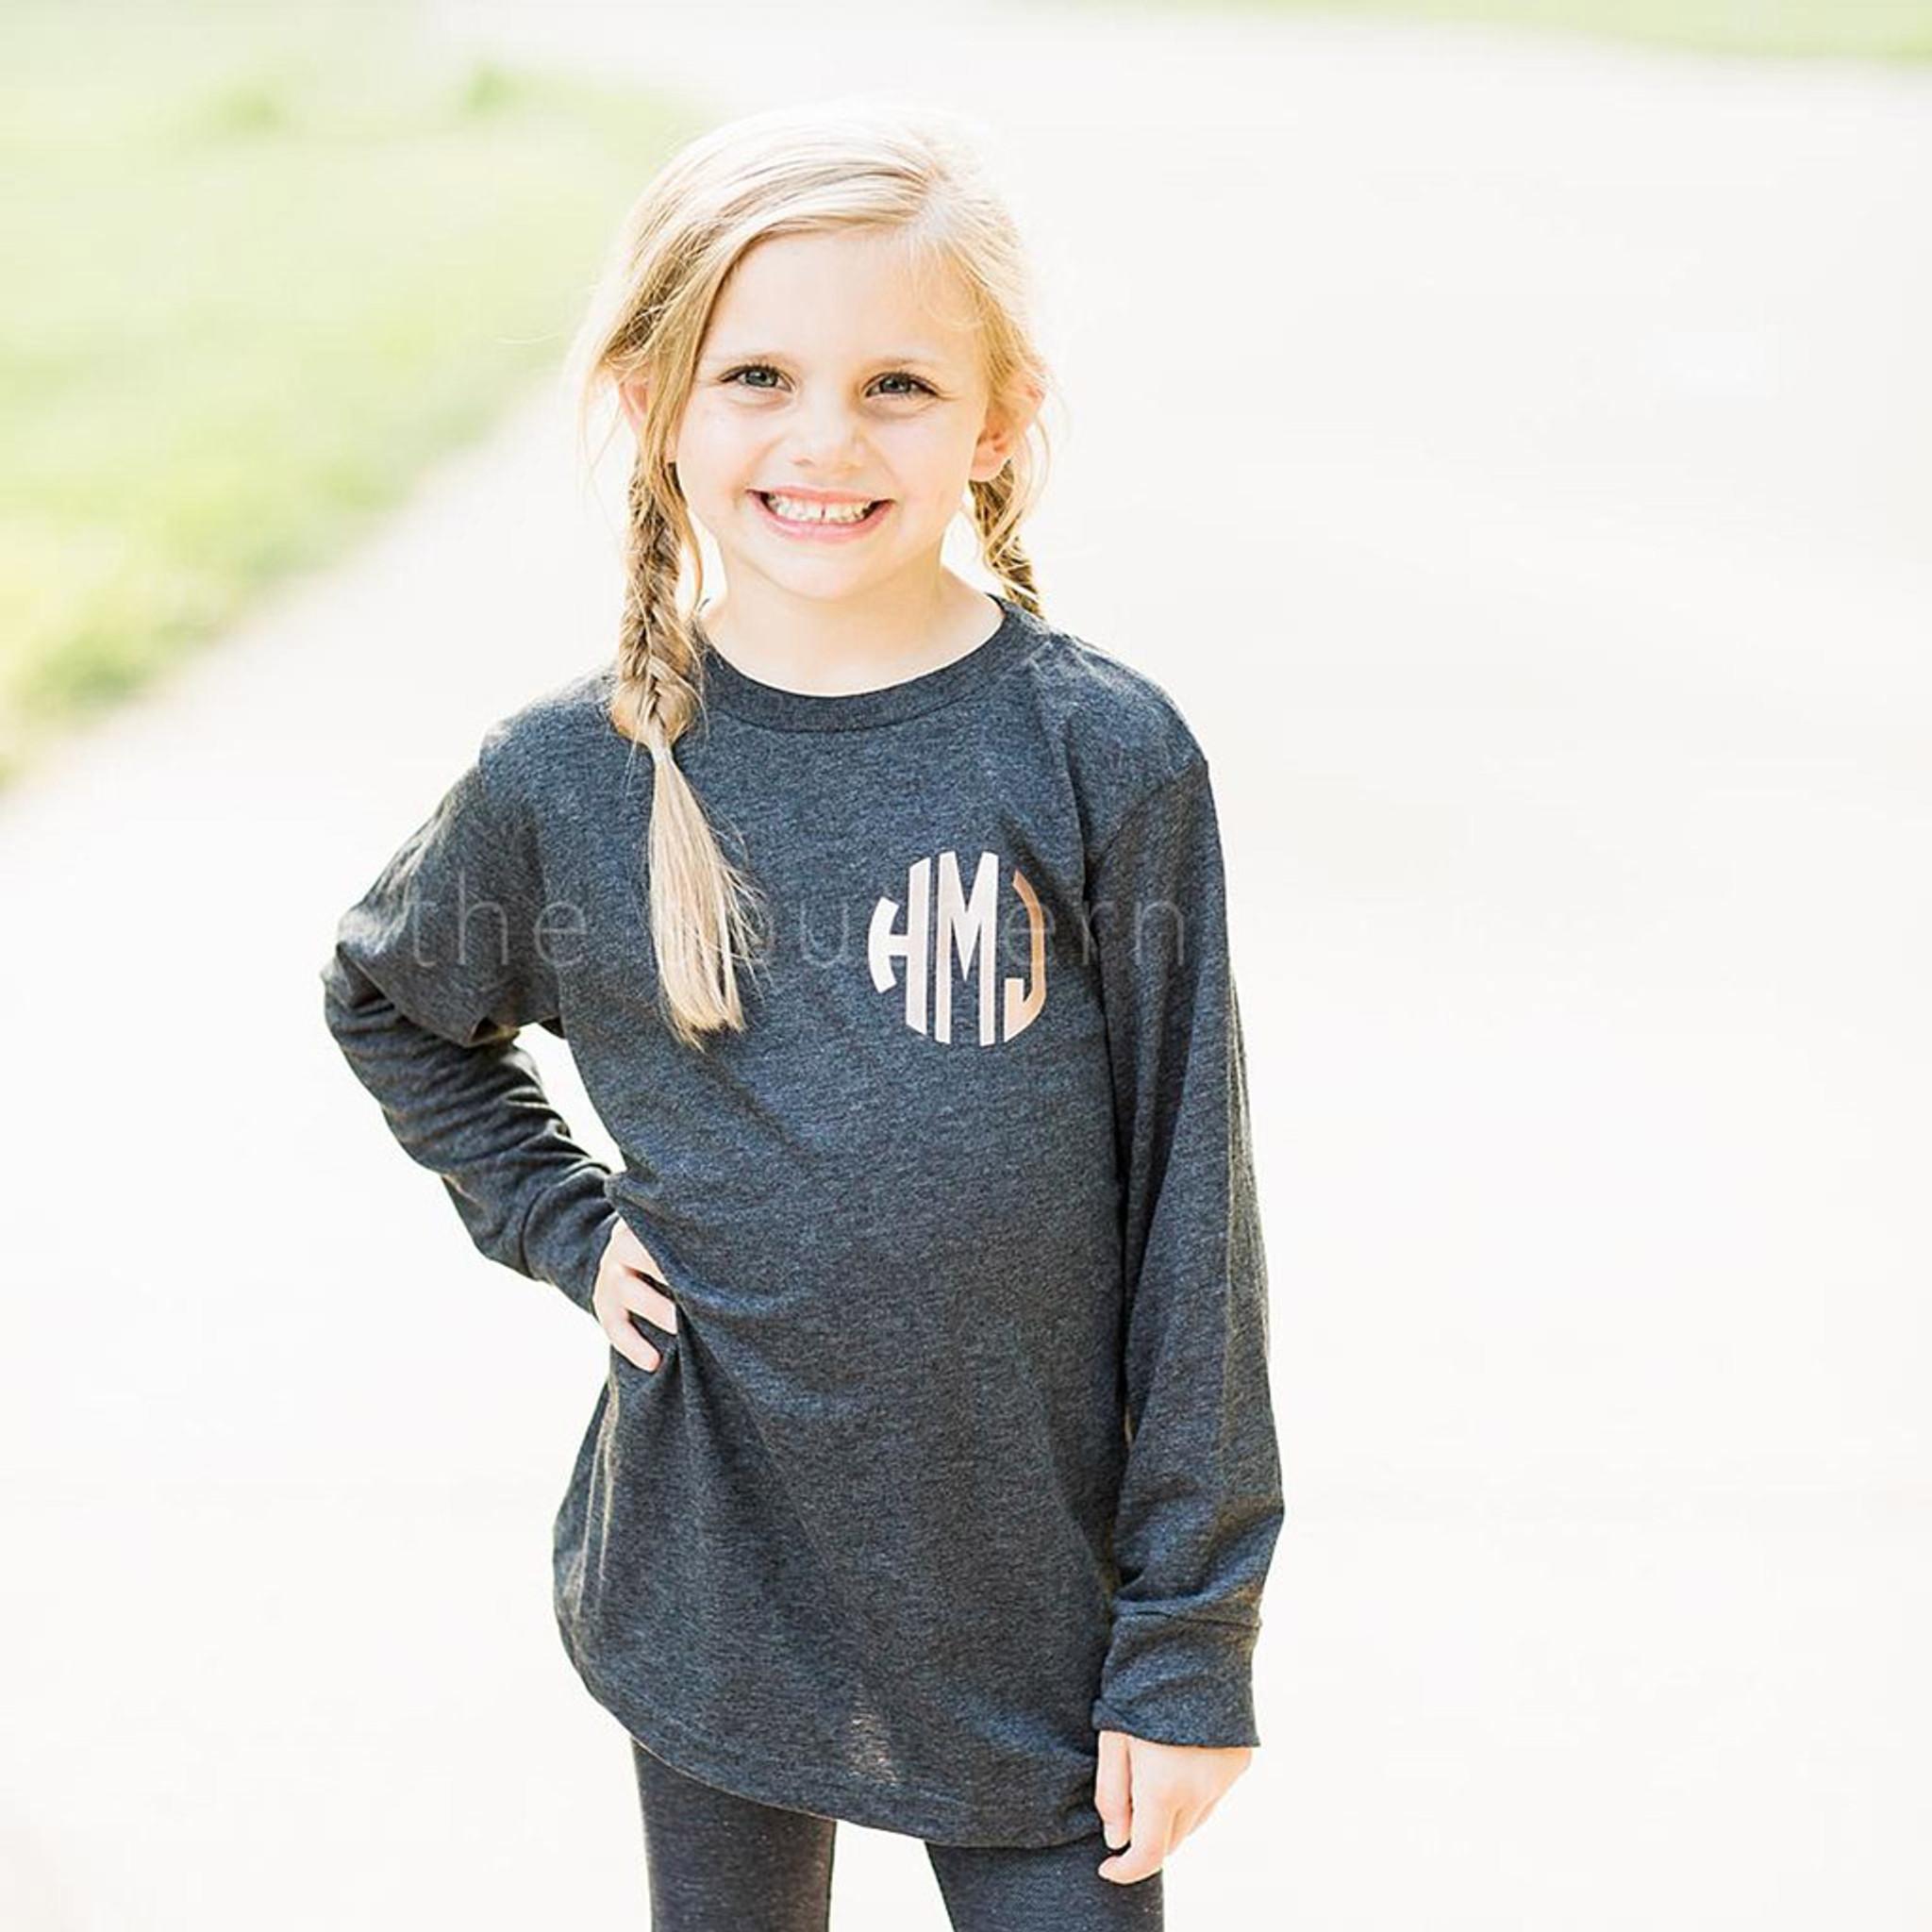 Long-Sleeve Youth Shirt